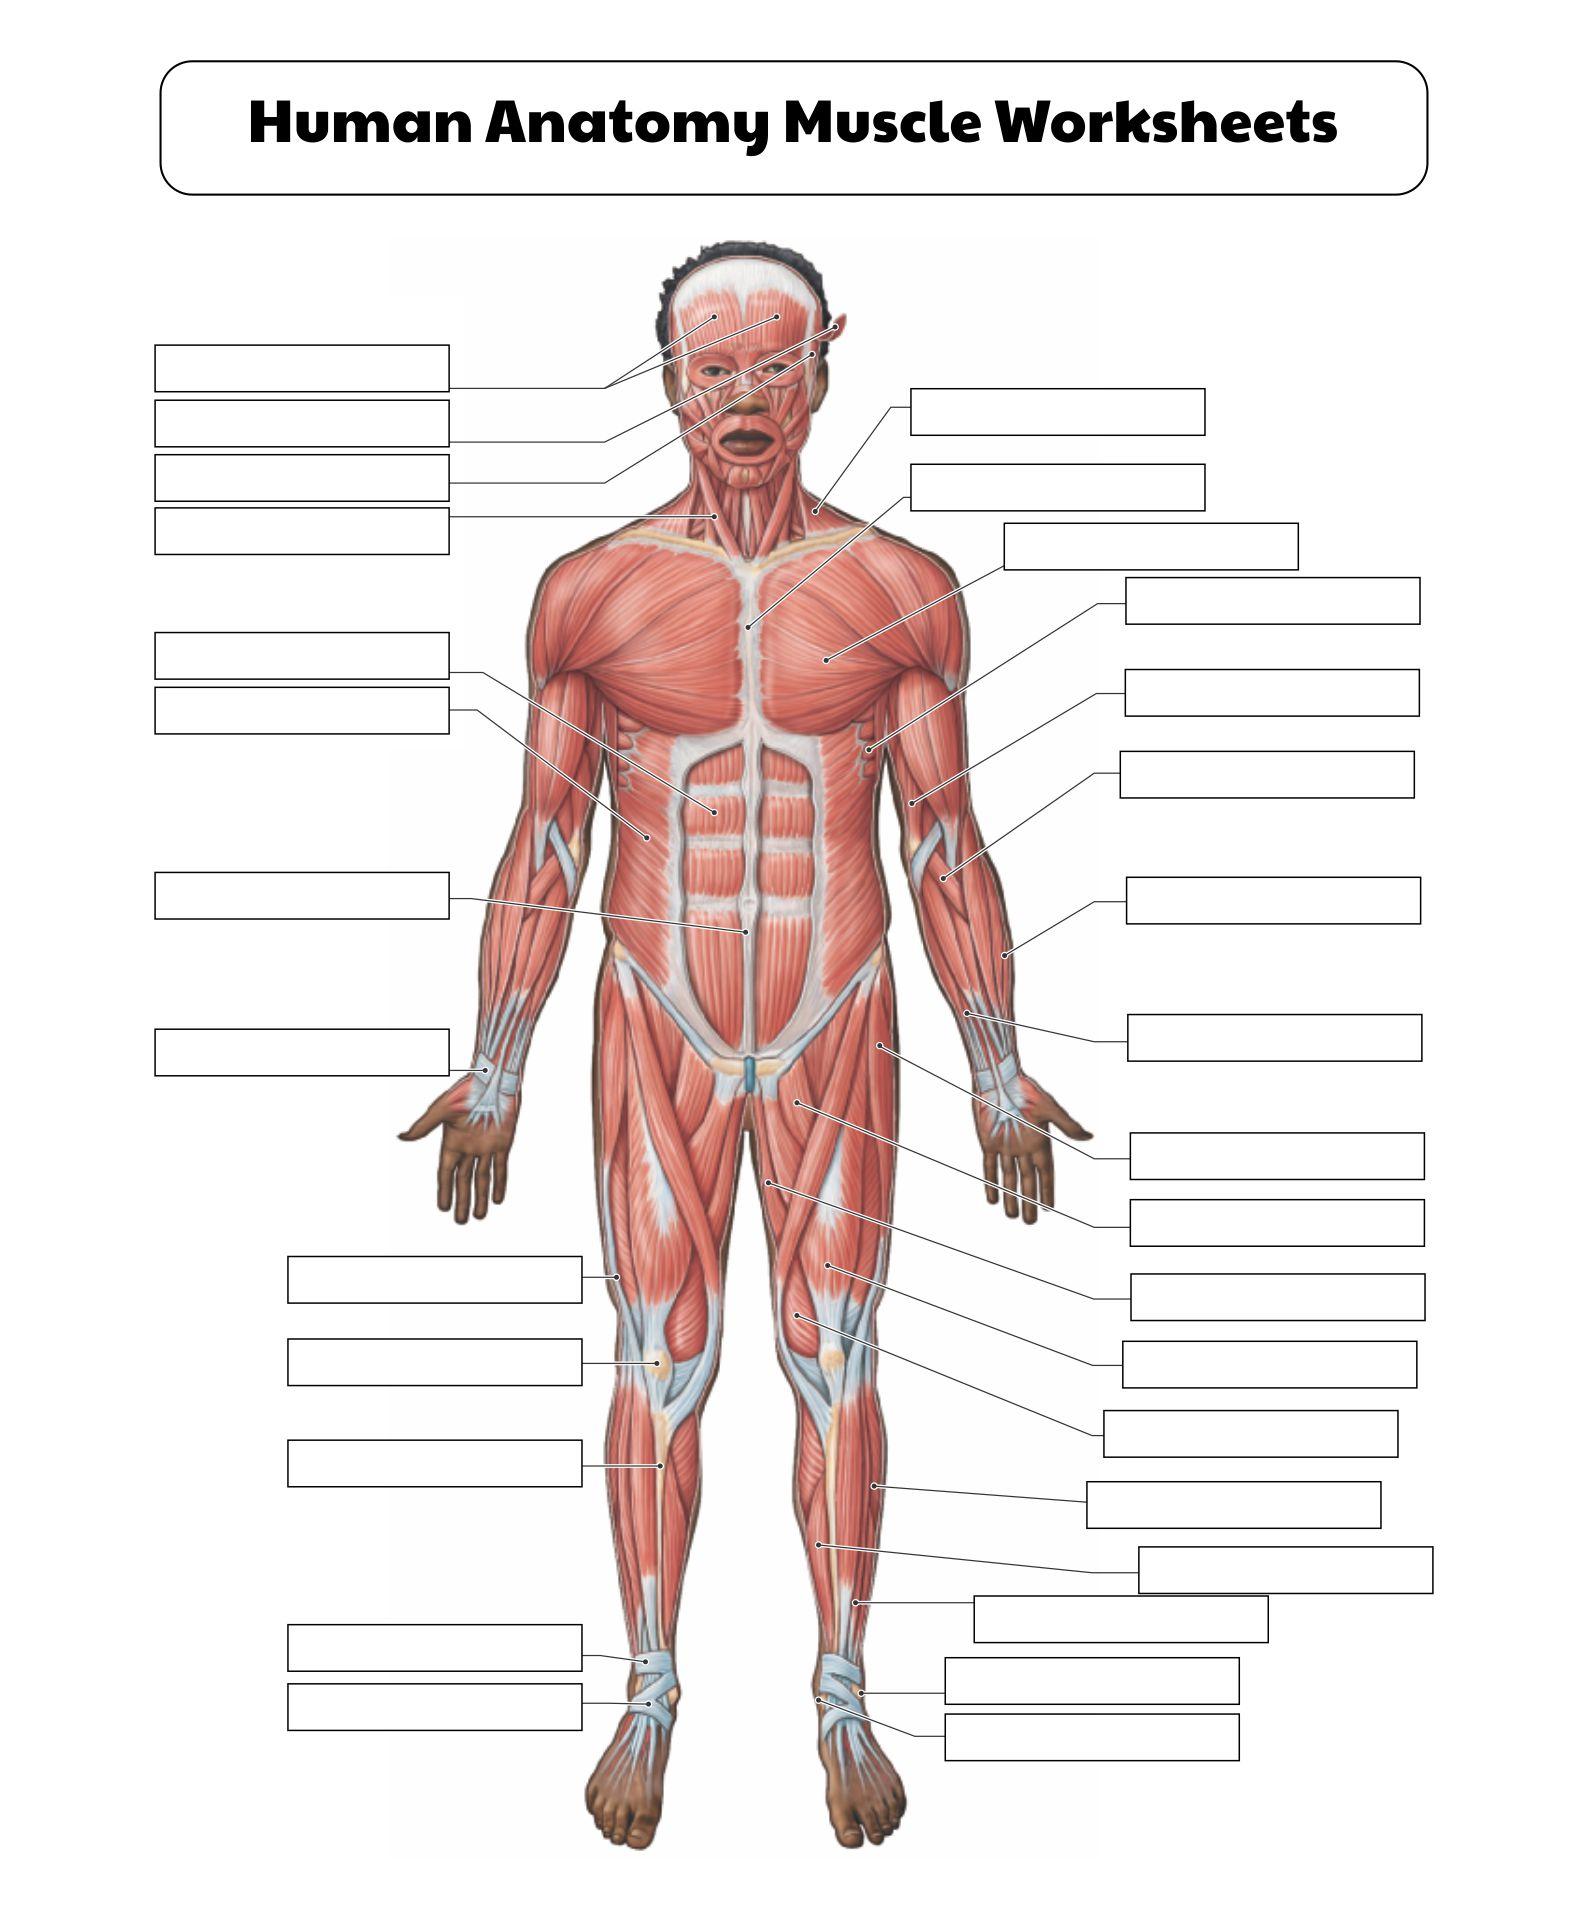 Human Anatomy Muscle Worksheets Printable